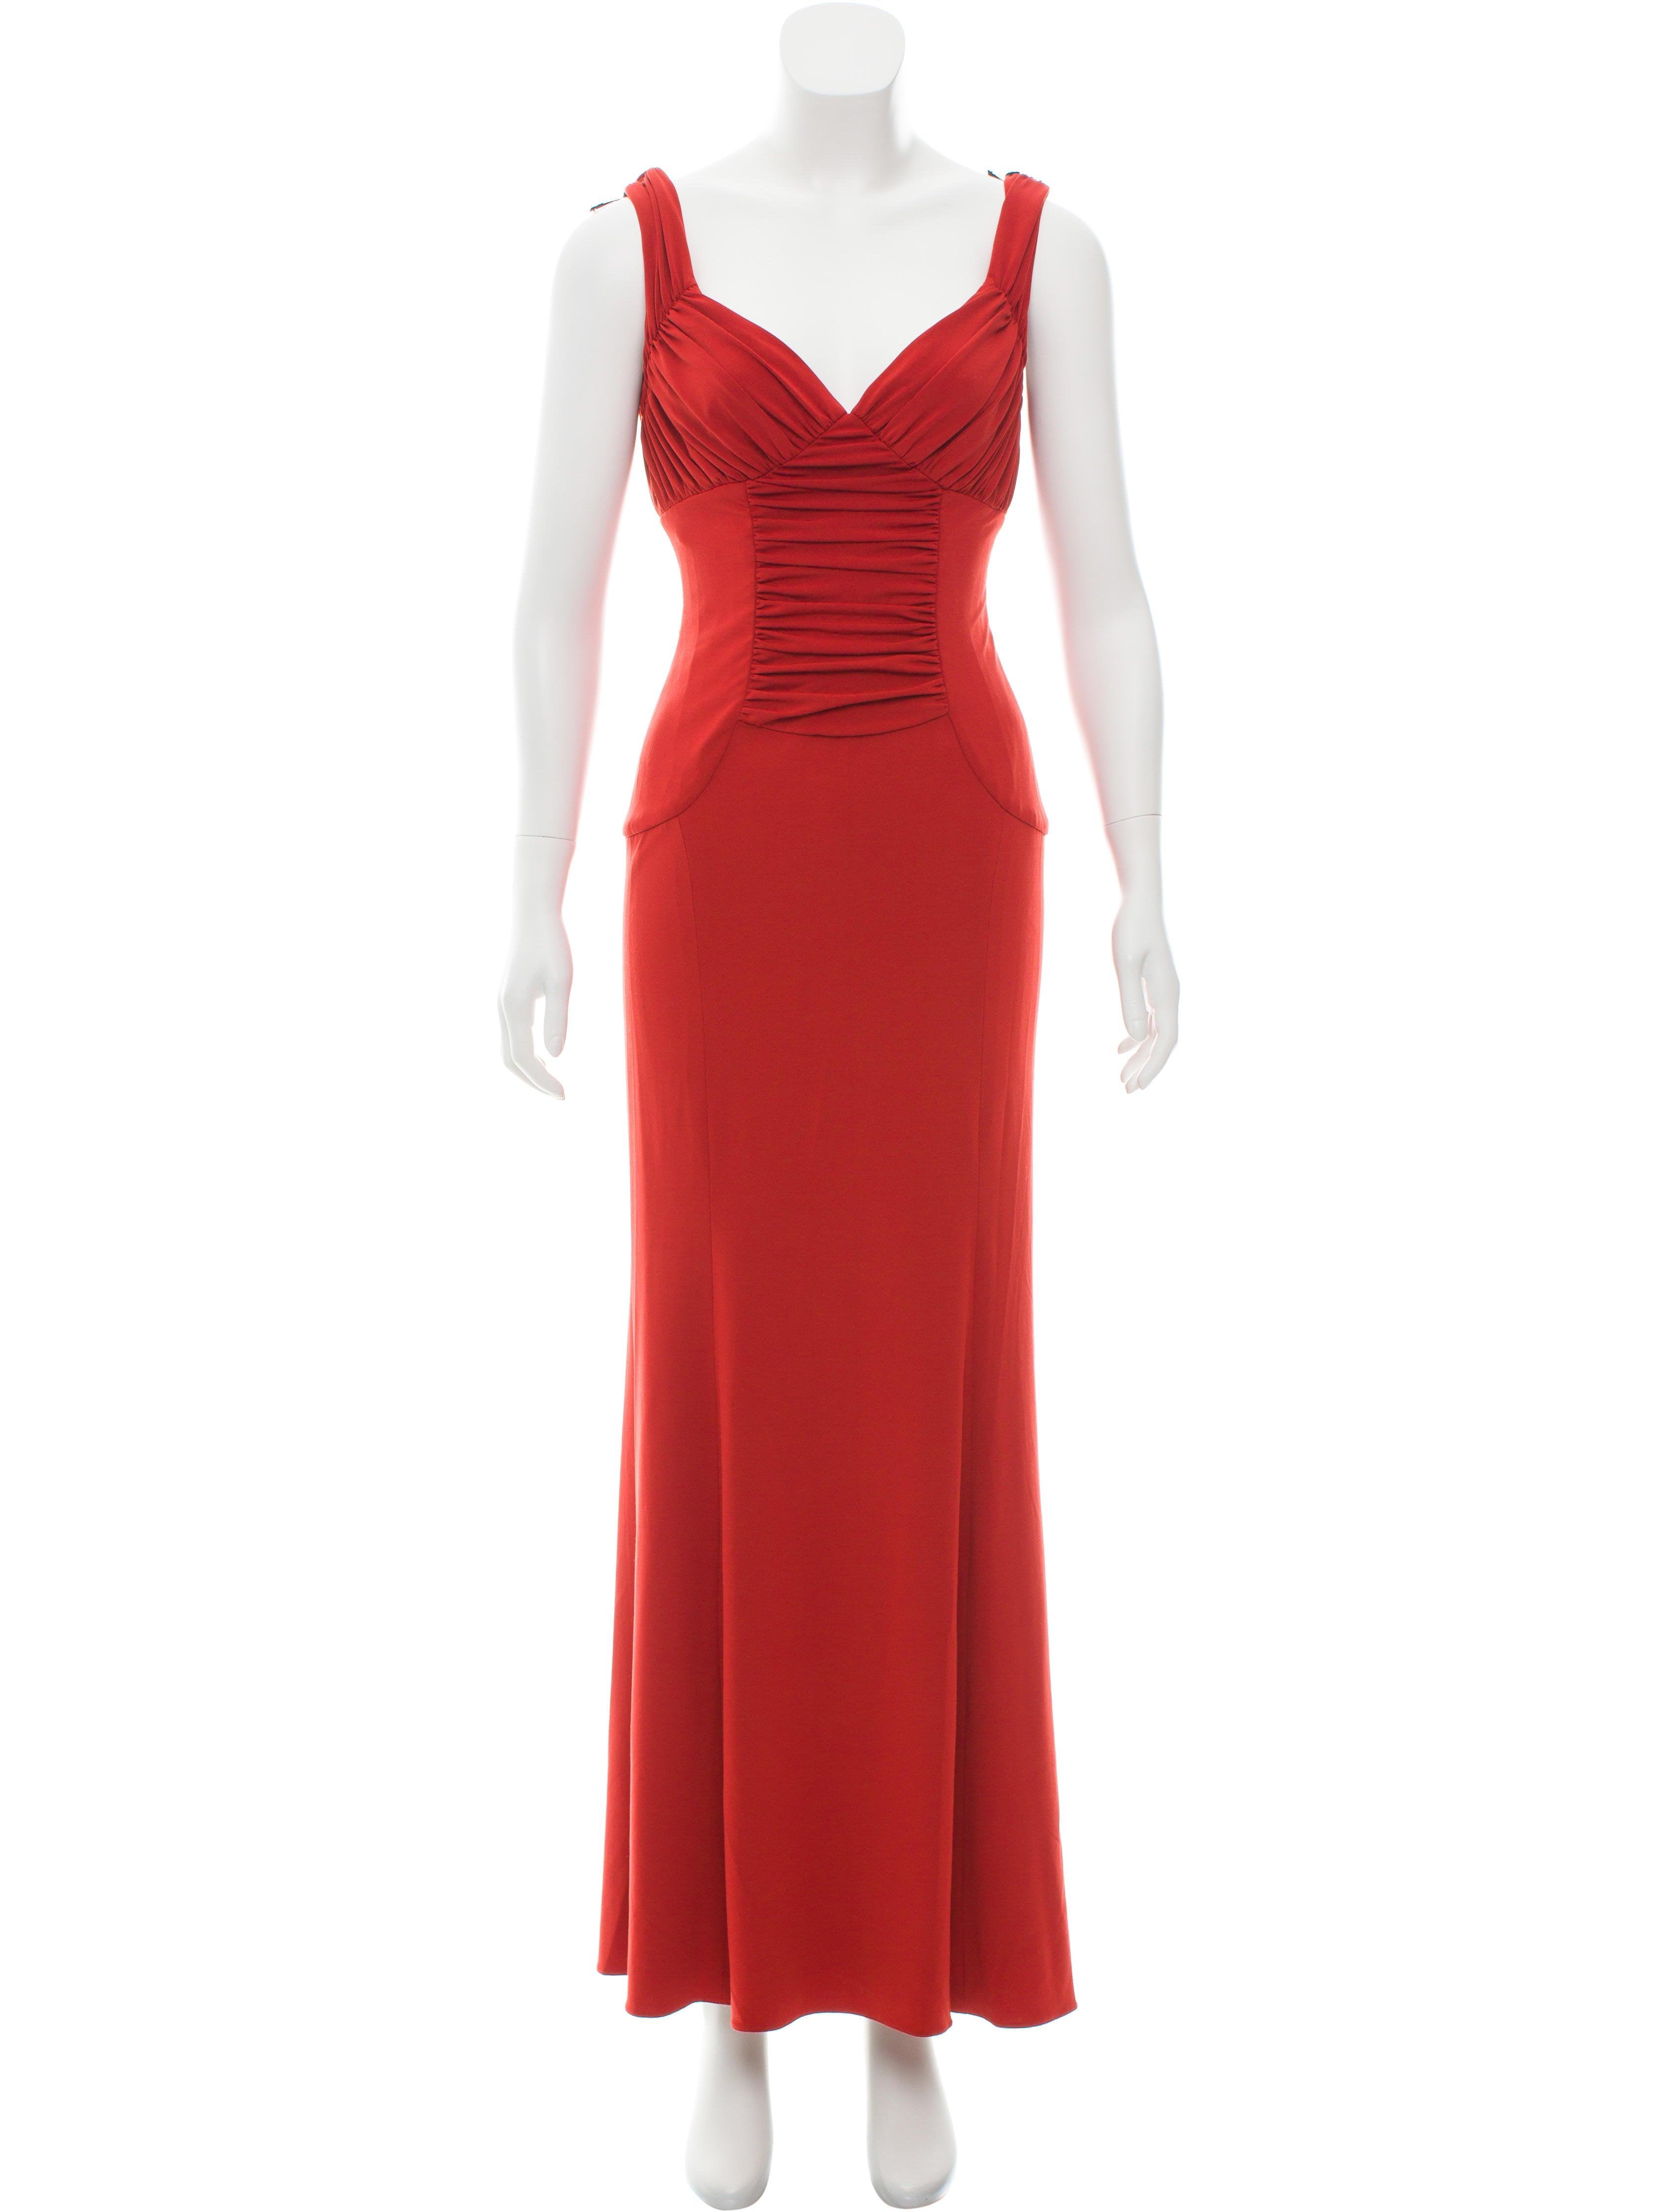 Vera Wang Ruched Evening Dress - Clothing - VER27629 | The RealReal